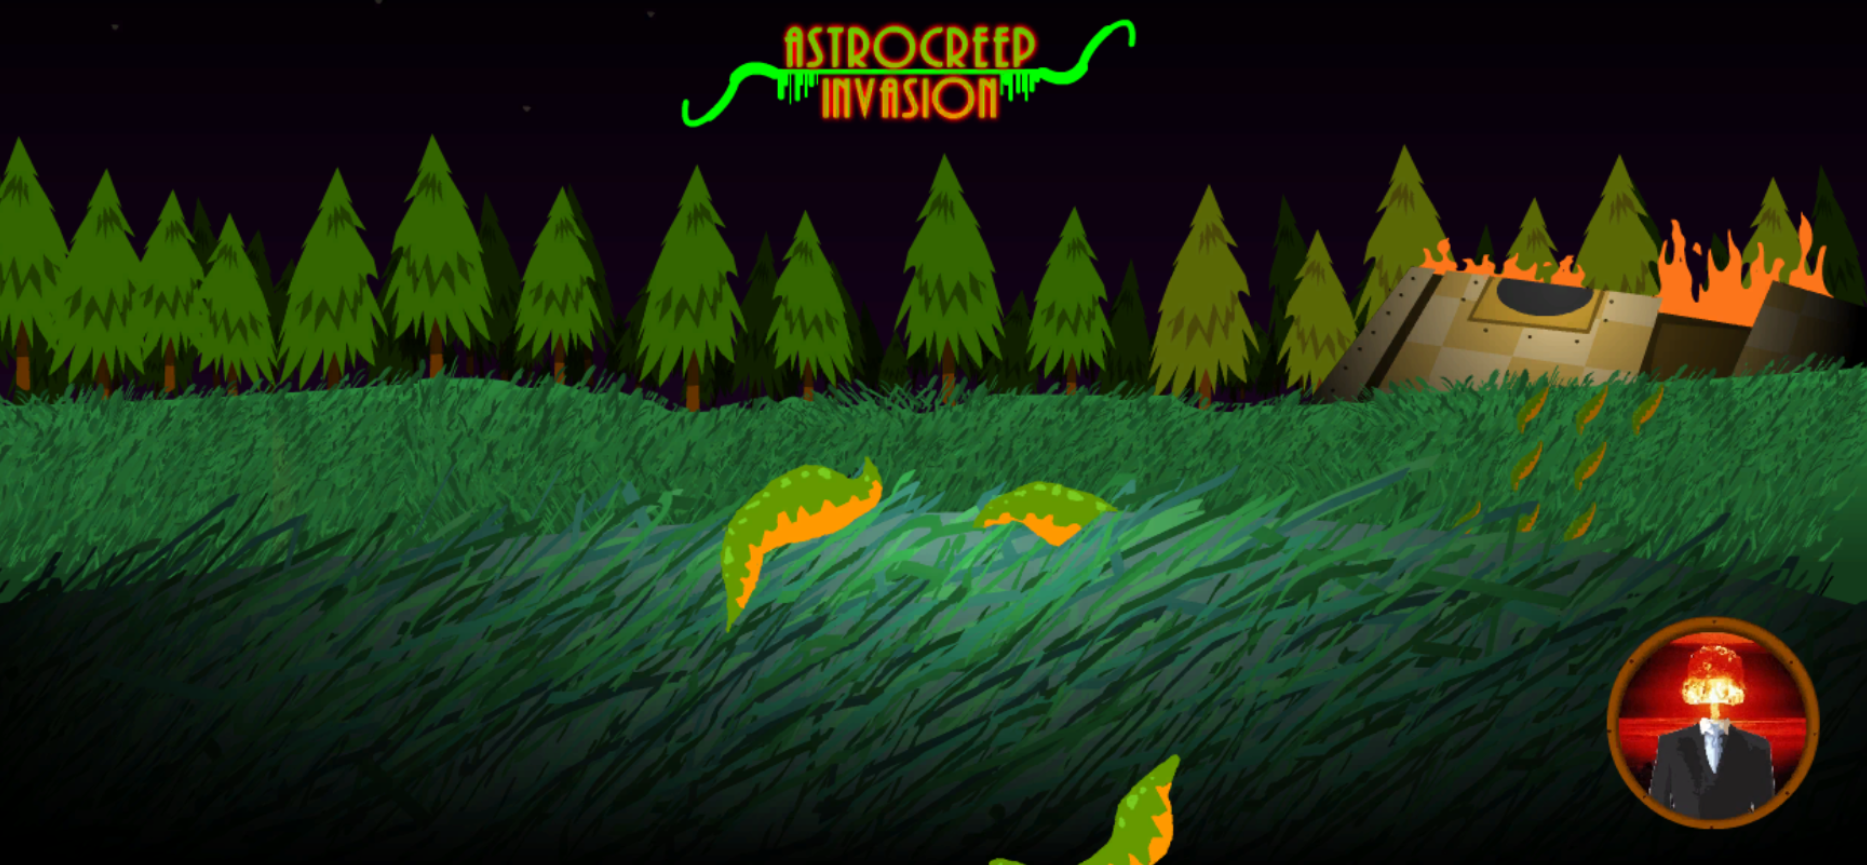 Astrocreep:Invasion